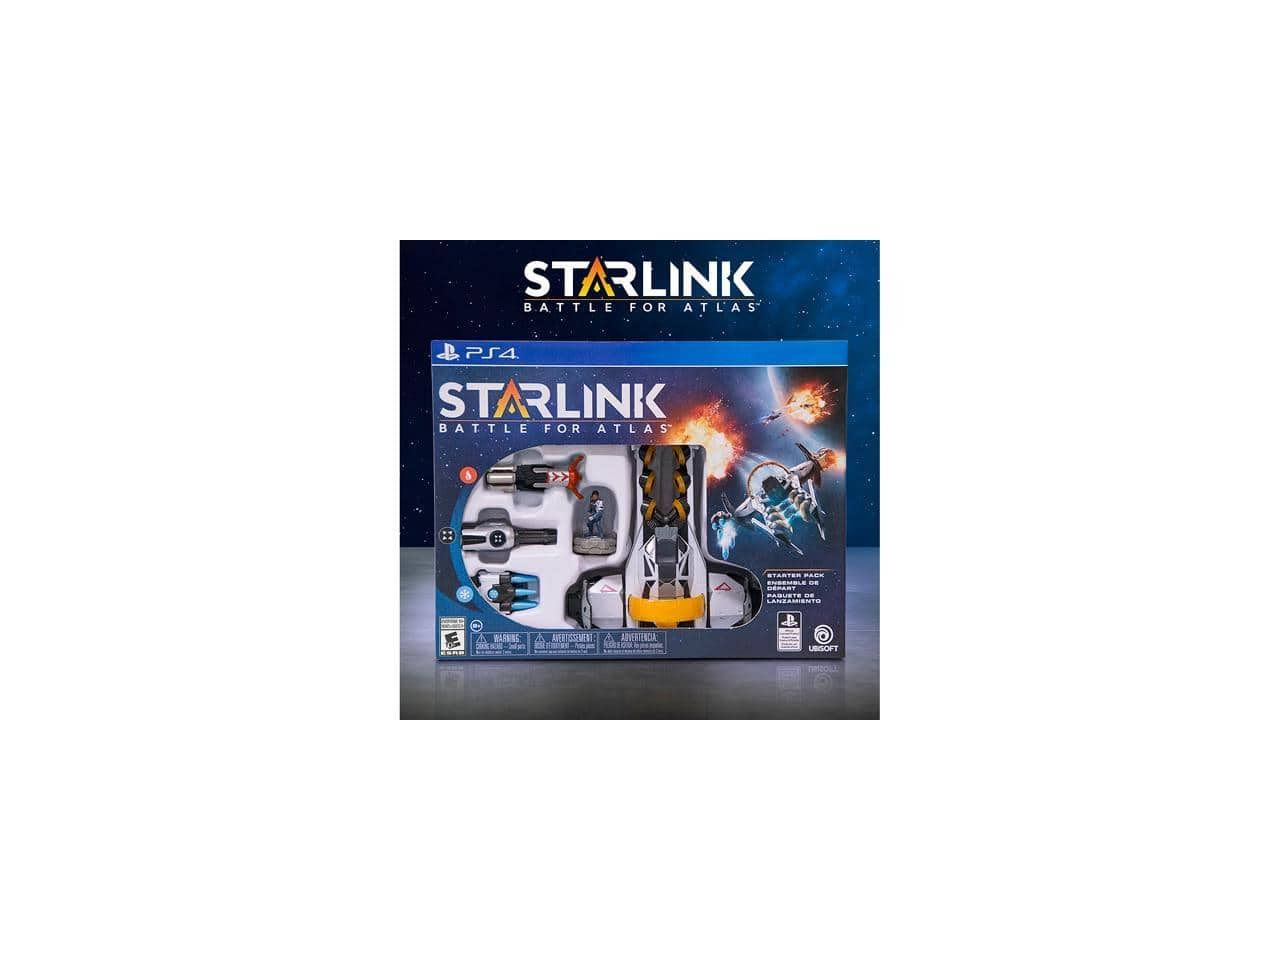 Starlink: Battle for Atlas Starter Pack - PlayStation 4 $13.32 @Newegg FS